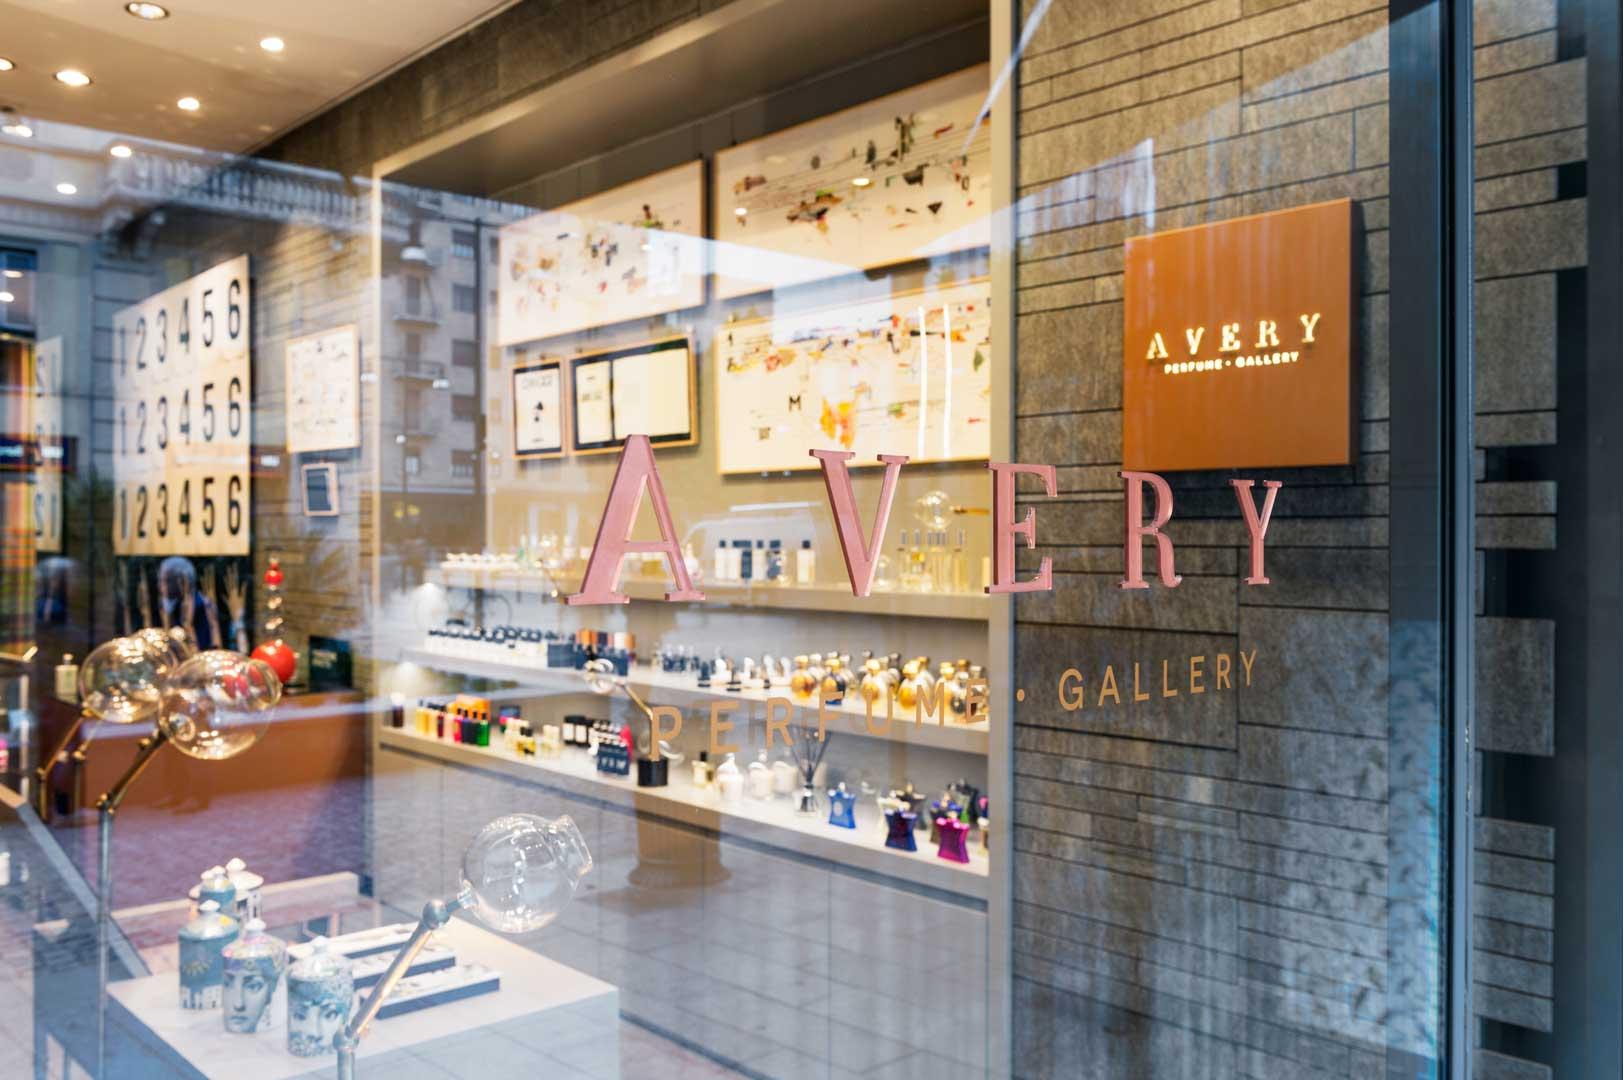 Avery perfume gallery corso como flawless milano for Corso arredatore d interni milano